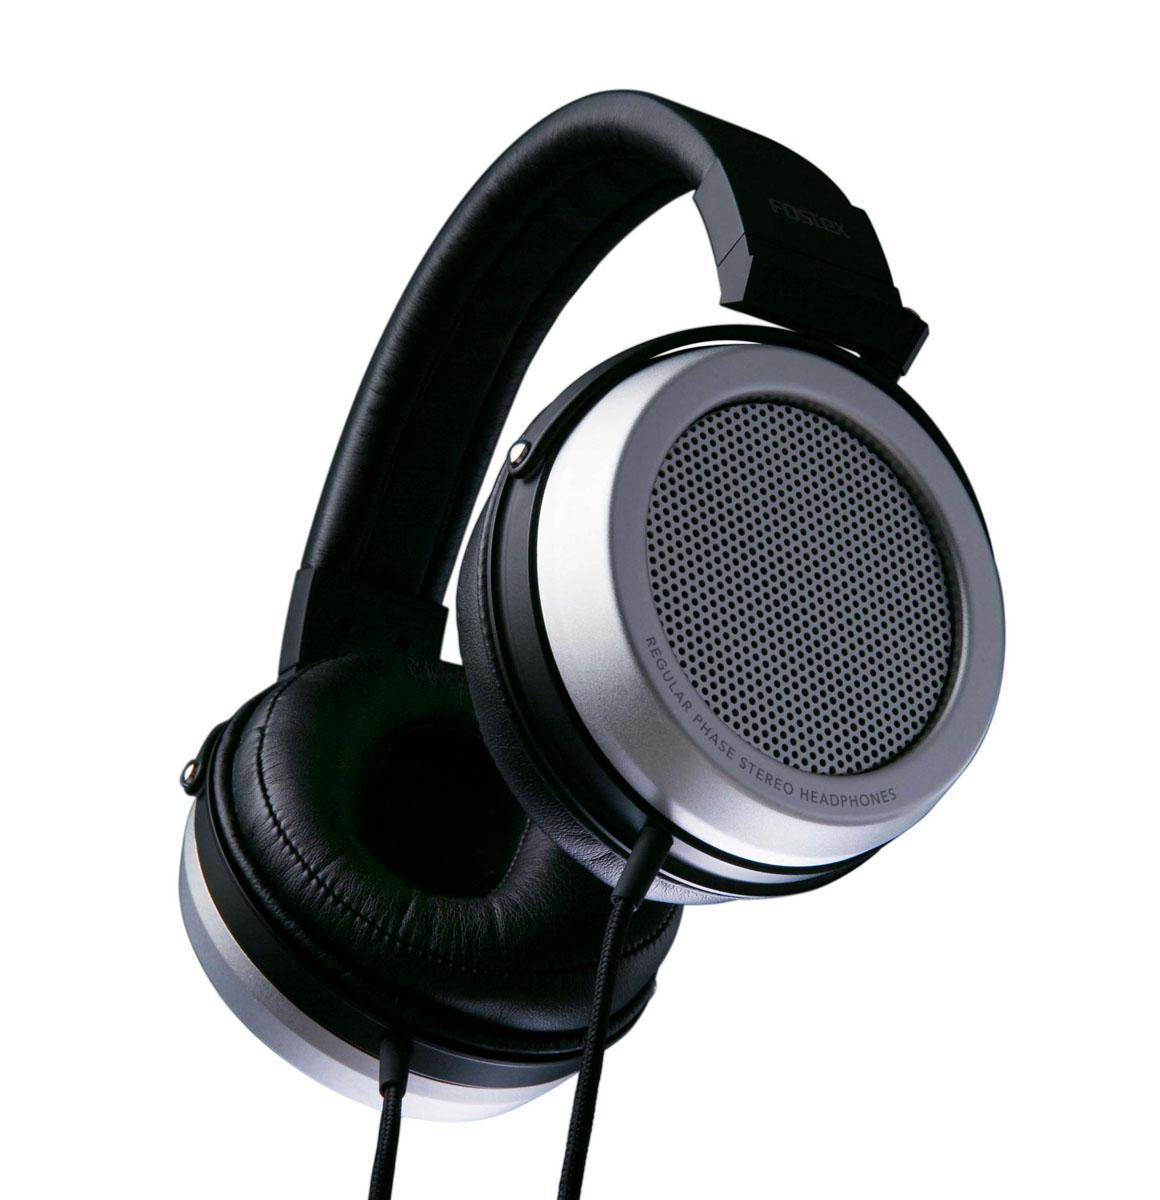 Fostex TH-500 RP Headphones Black